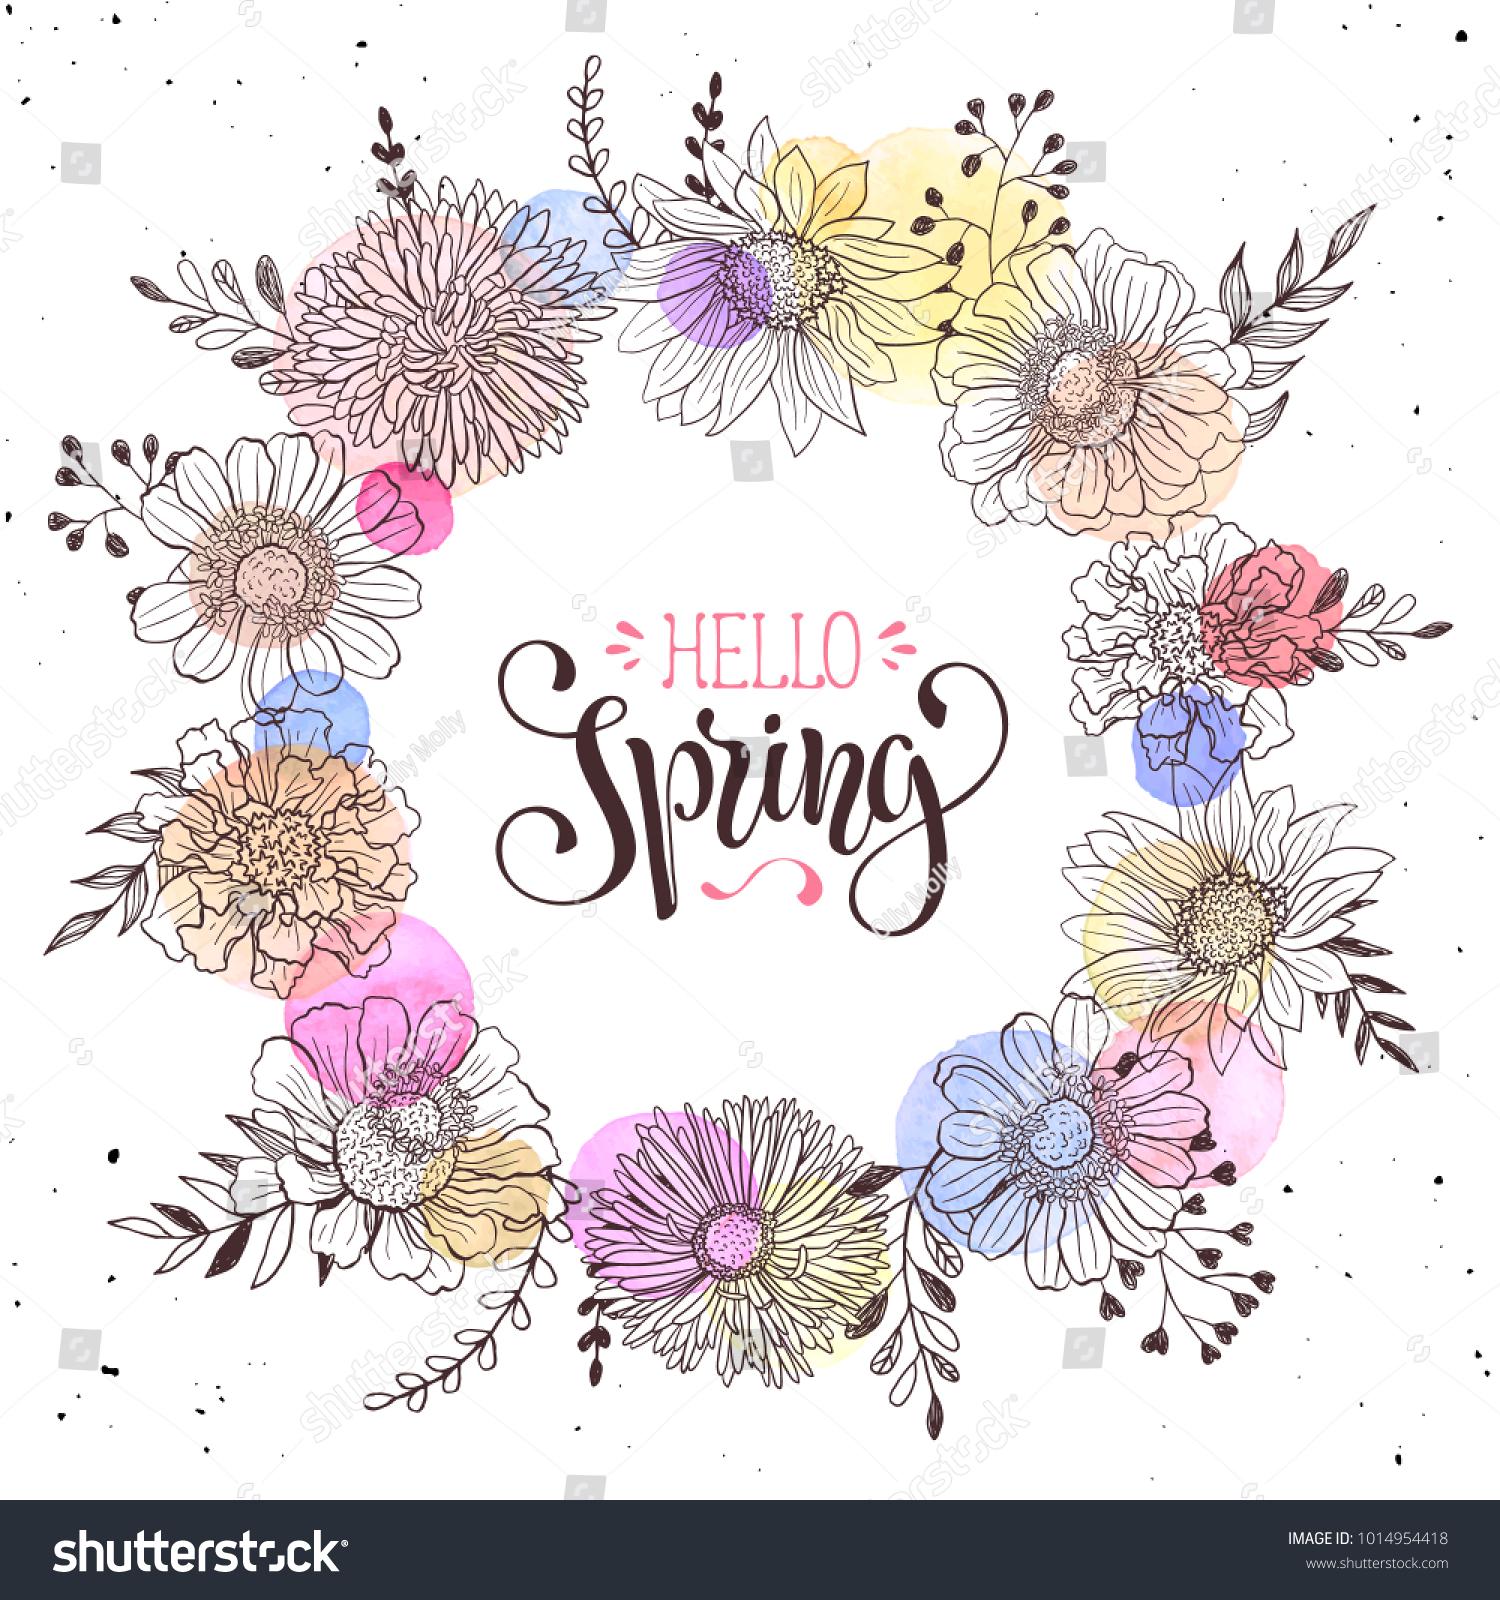 Floral wreath hello spring text romantic stock vector 1014954418 floral wreath hello spring text romantic stock vector 1014954418 shutterstock stopboris Choice Image